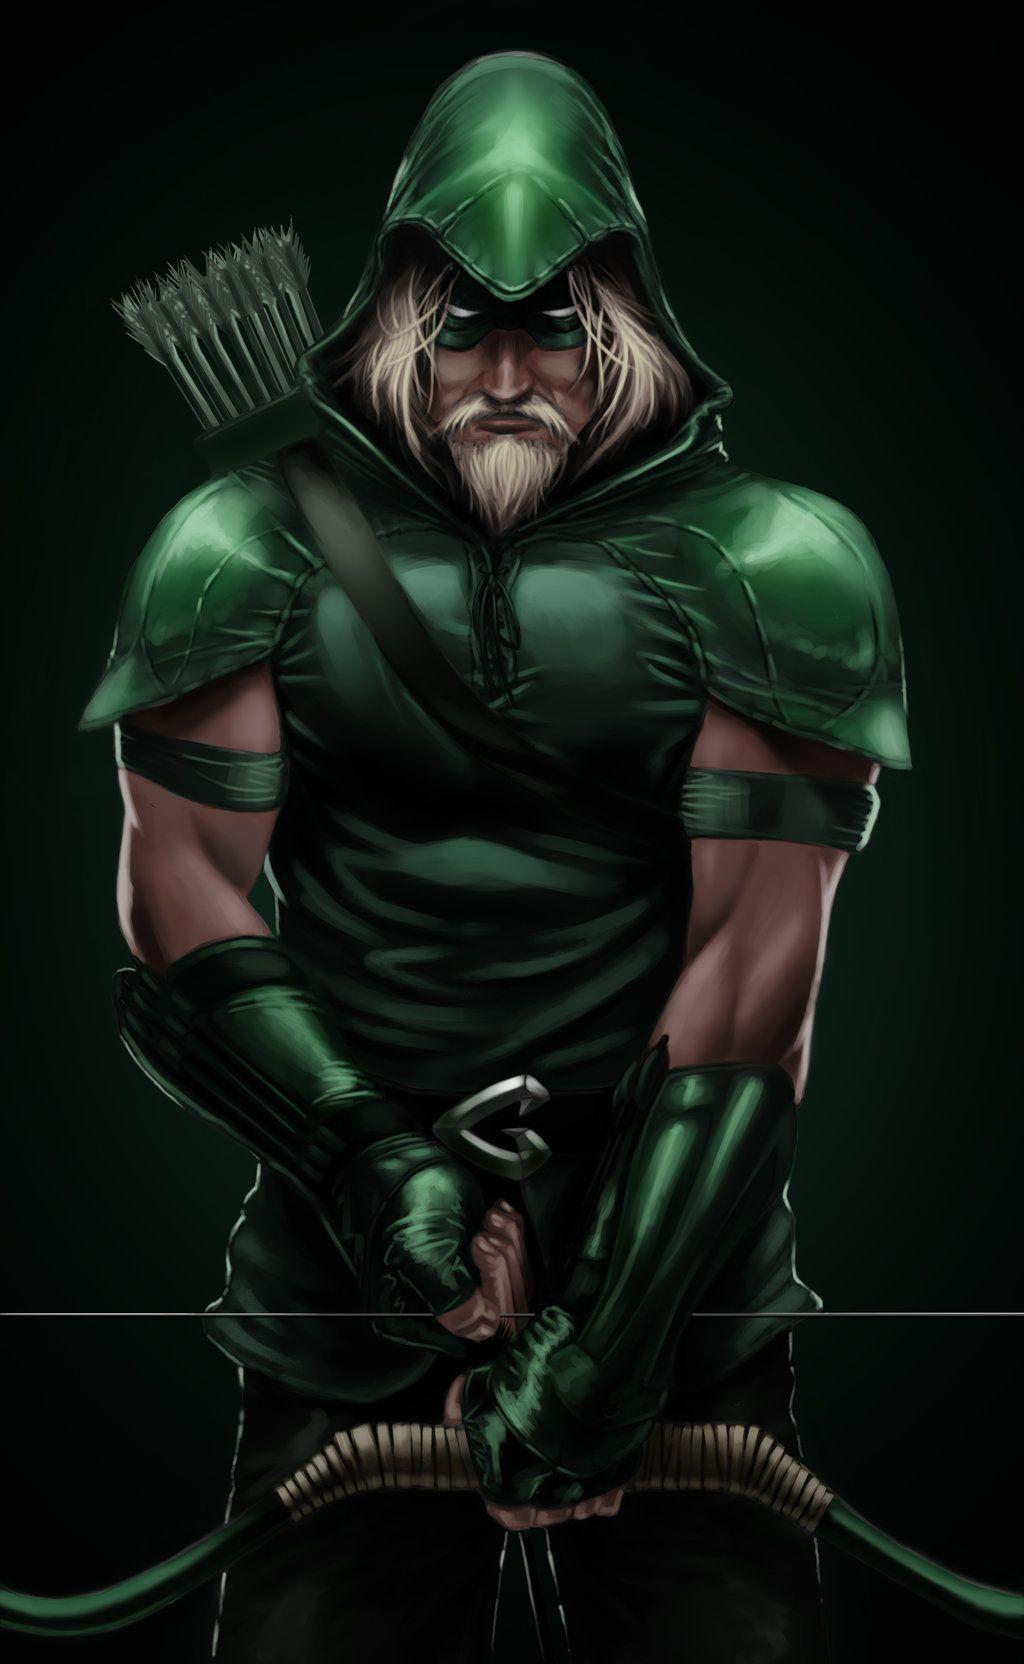 Deadpool & Moon Knight VS Green Arrow Catwoman & Nightwing - Battles